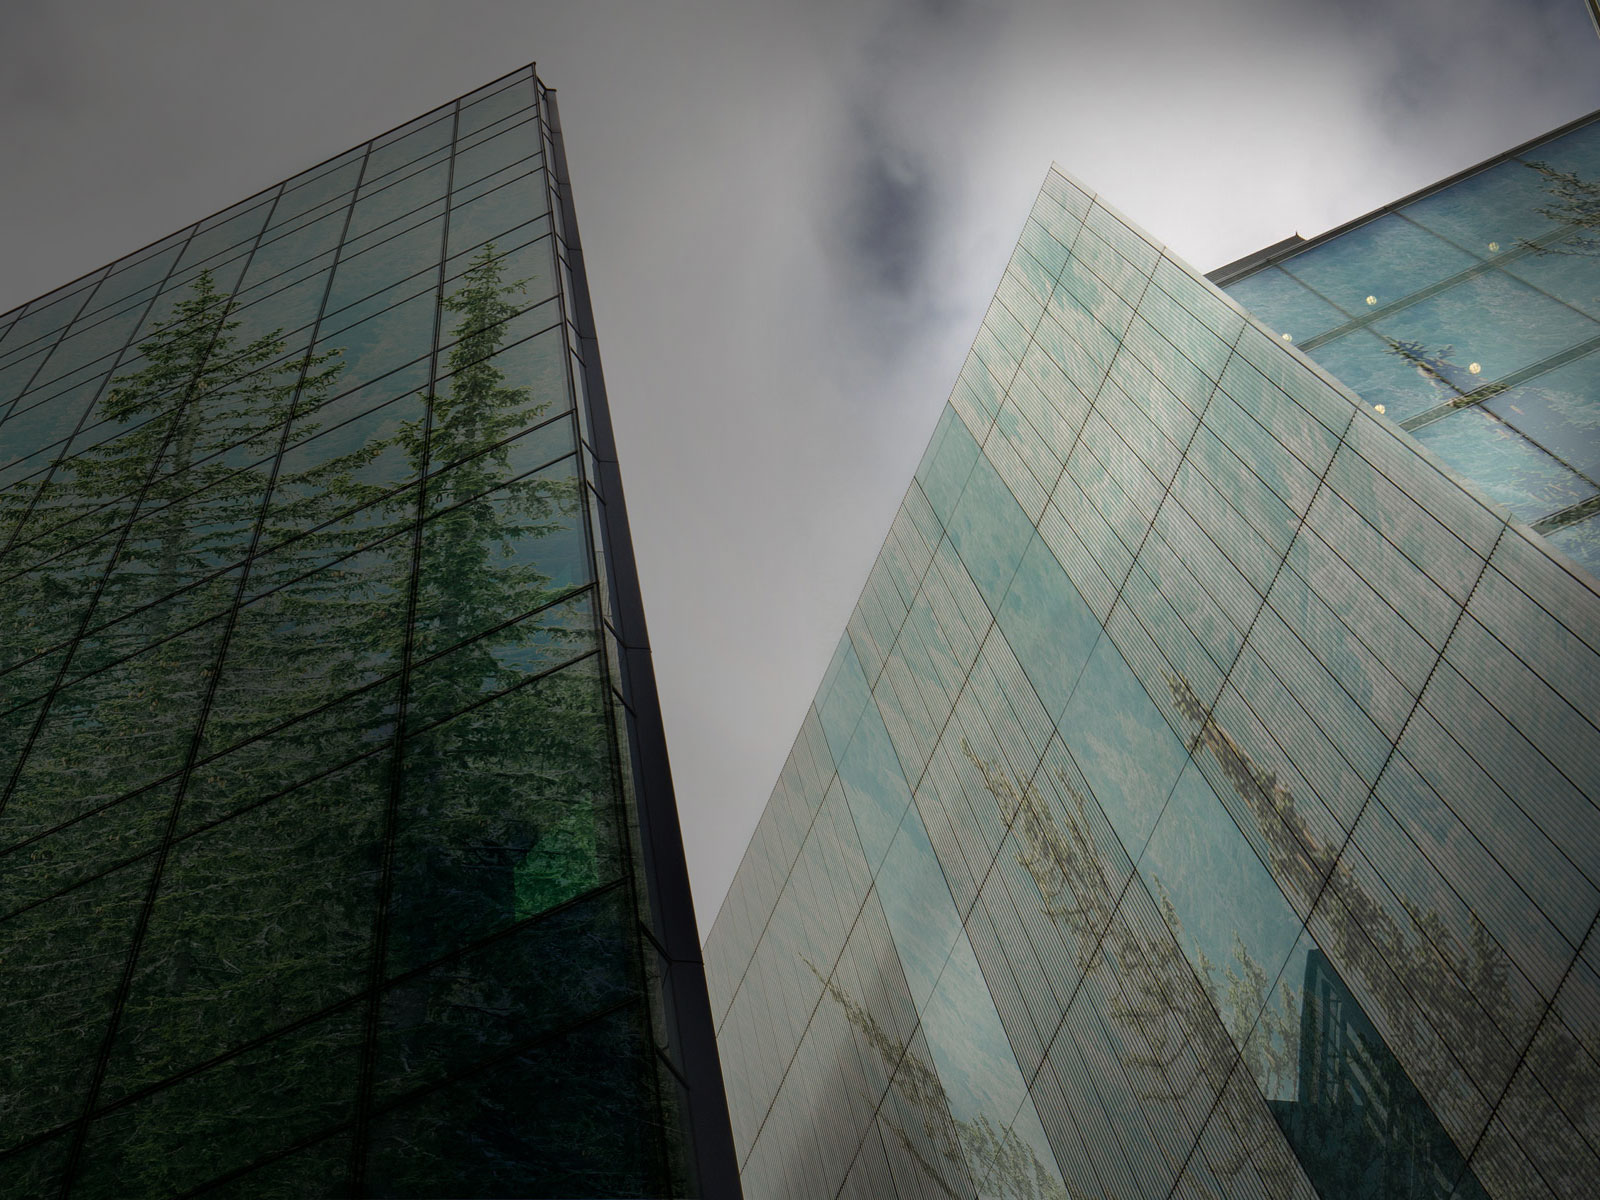 LaserCycle USA Corporate Sustainability